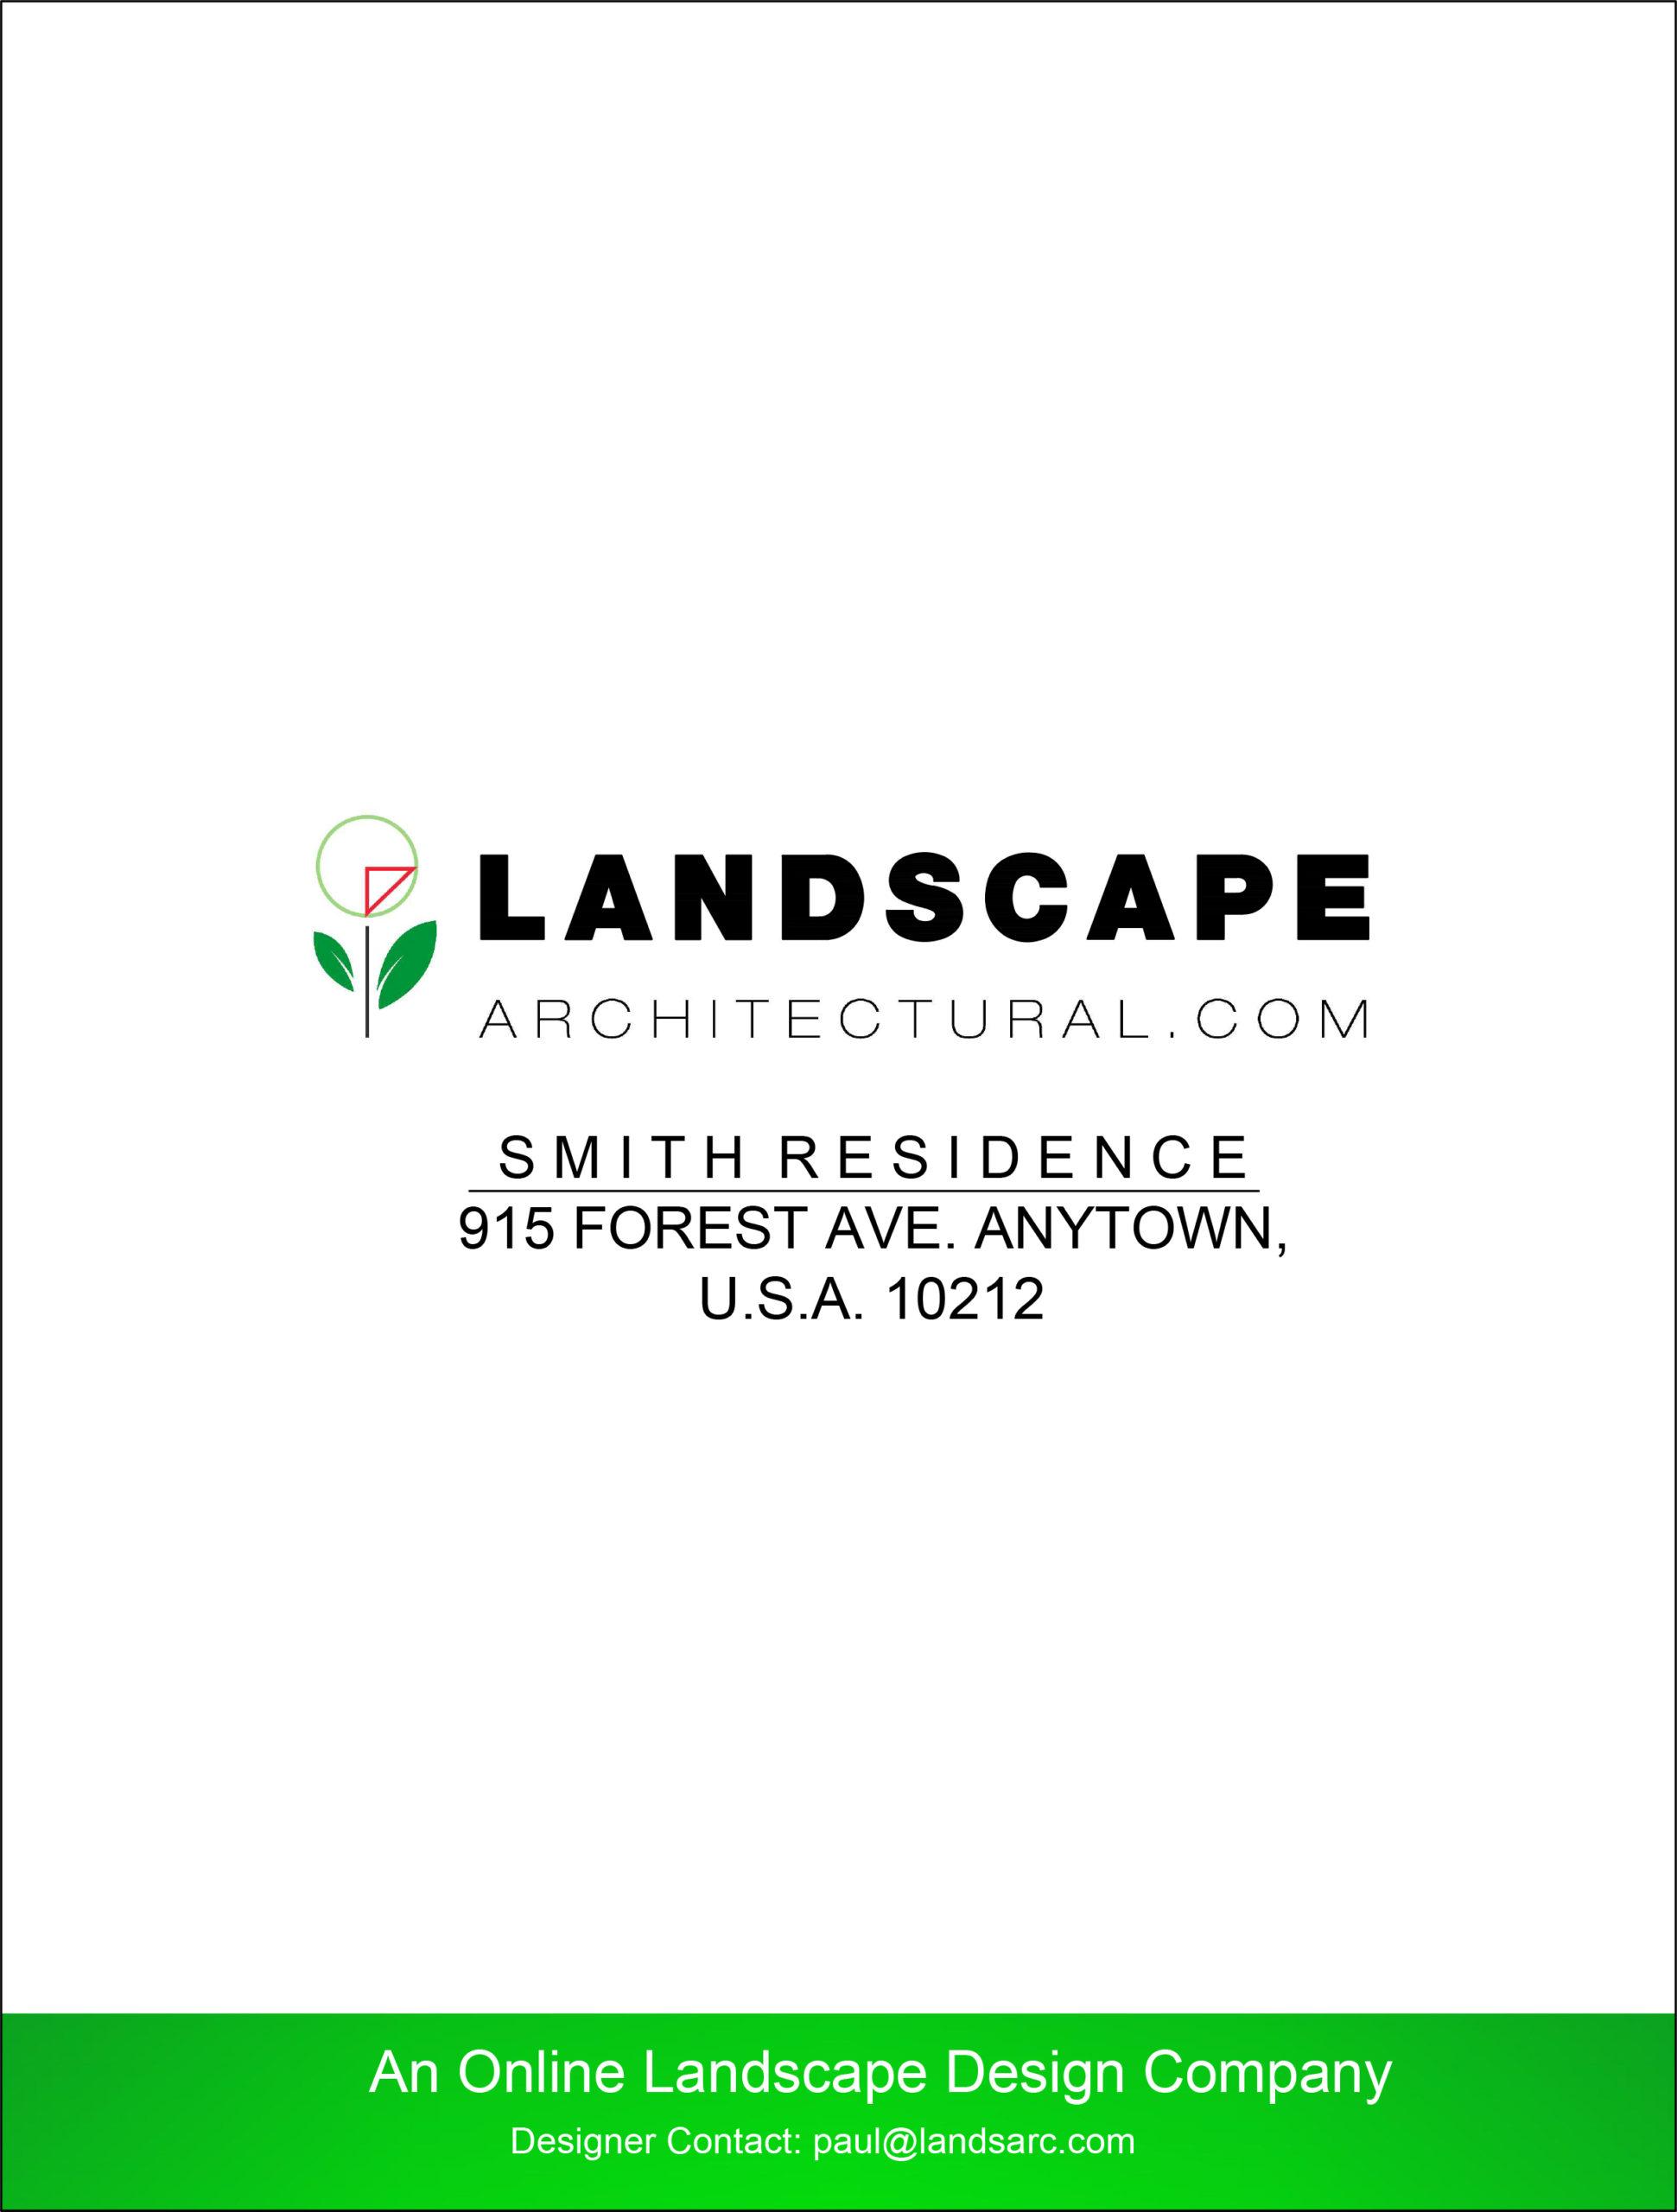 LandscapeArchitectural.com Cover Page